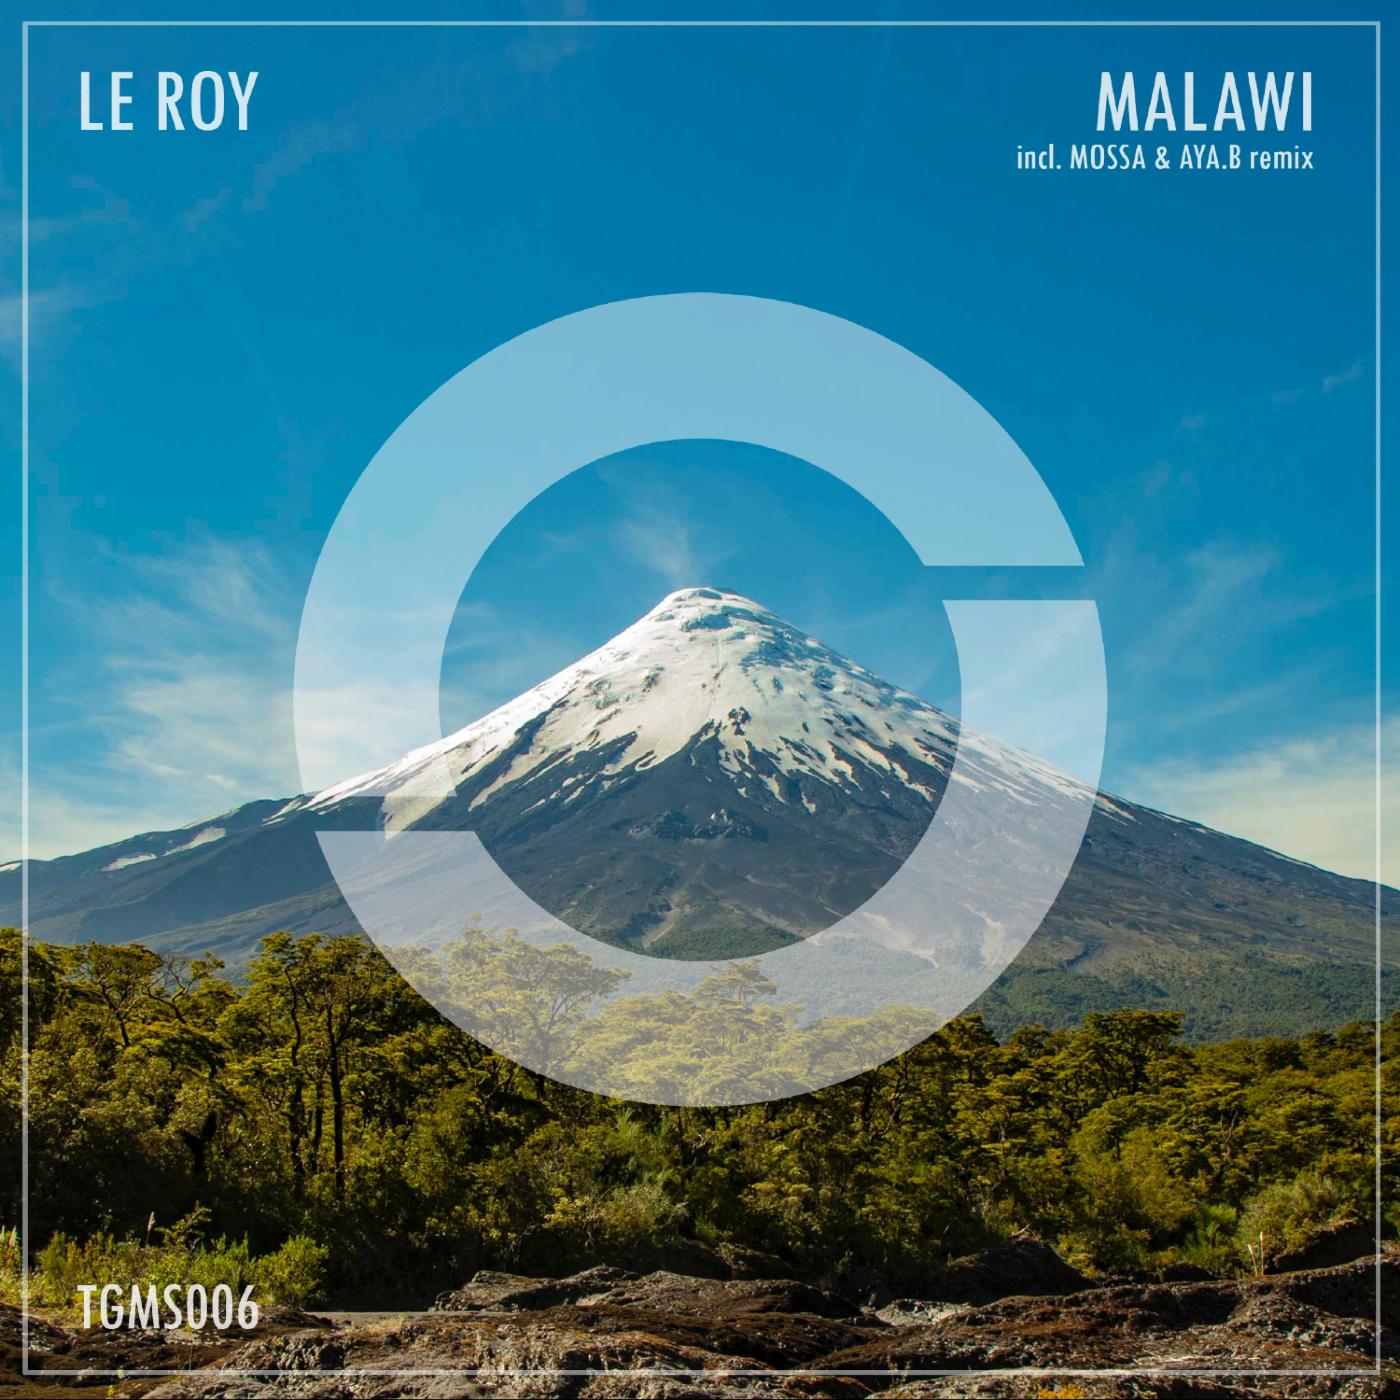 Le Roy - Malawi (incl. Mossa & Aya.B remix)